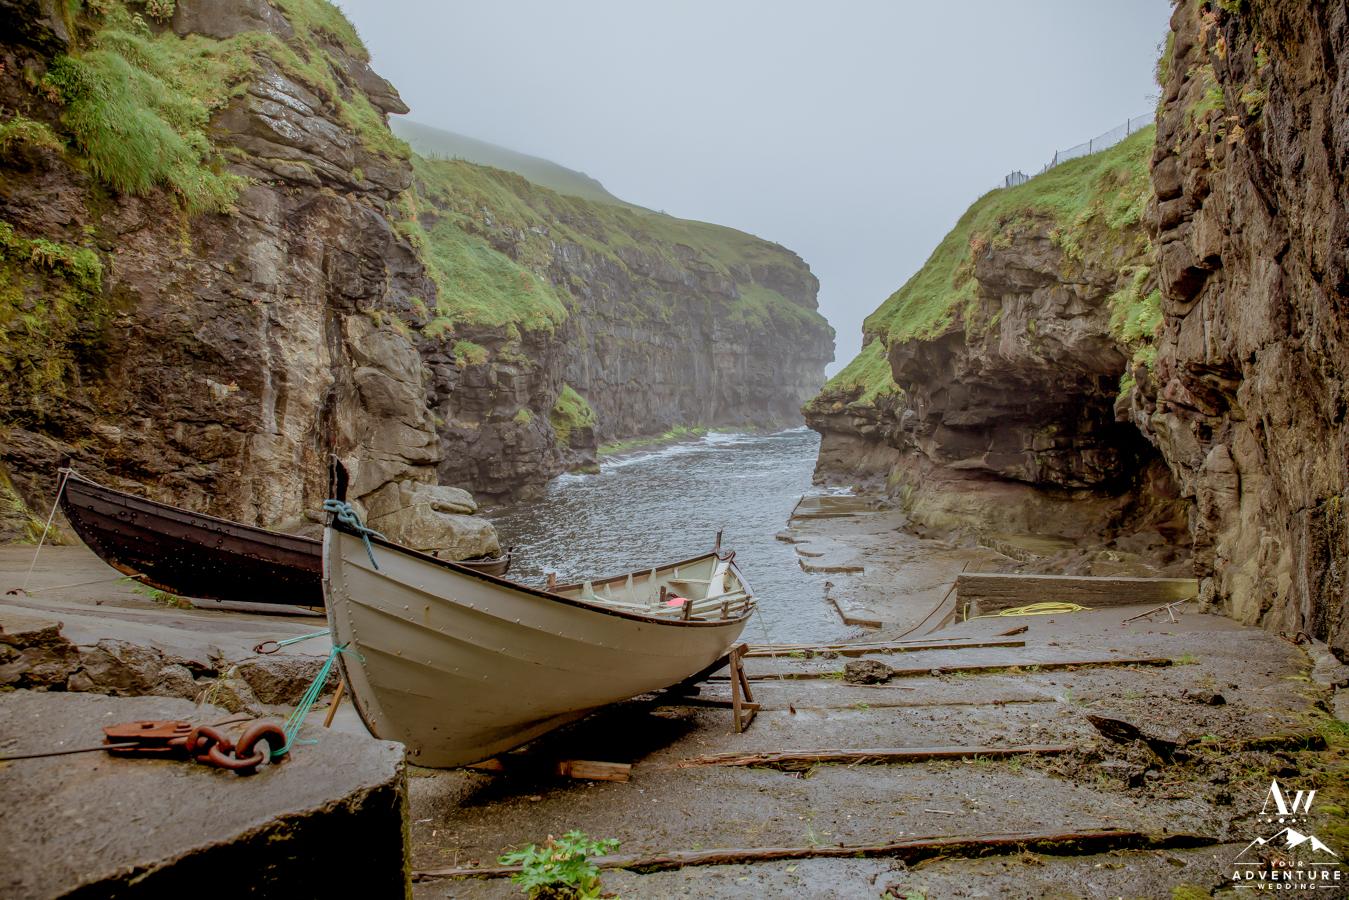 adventure weddings & eloping in the Faroe Islands-Boat in Canyon